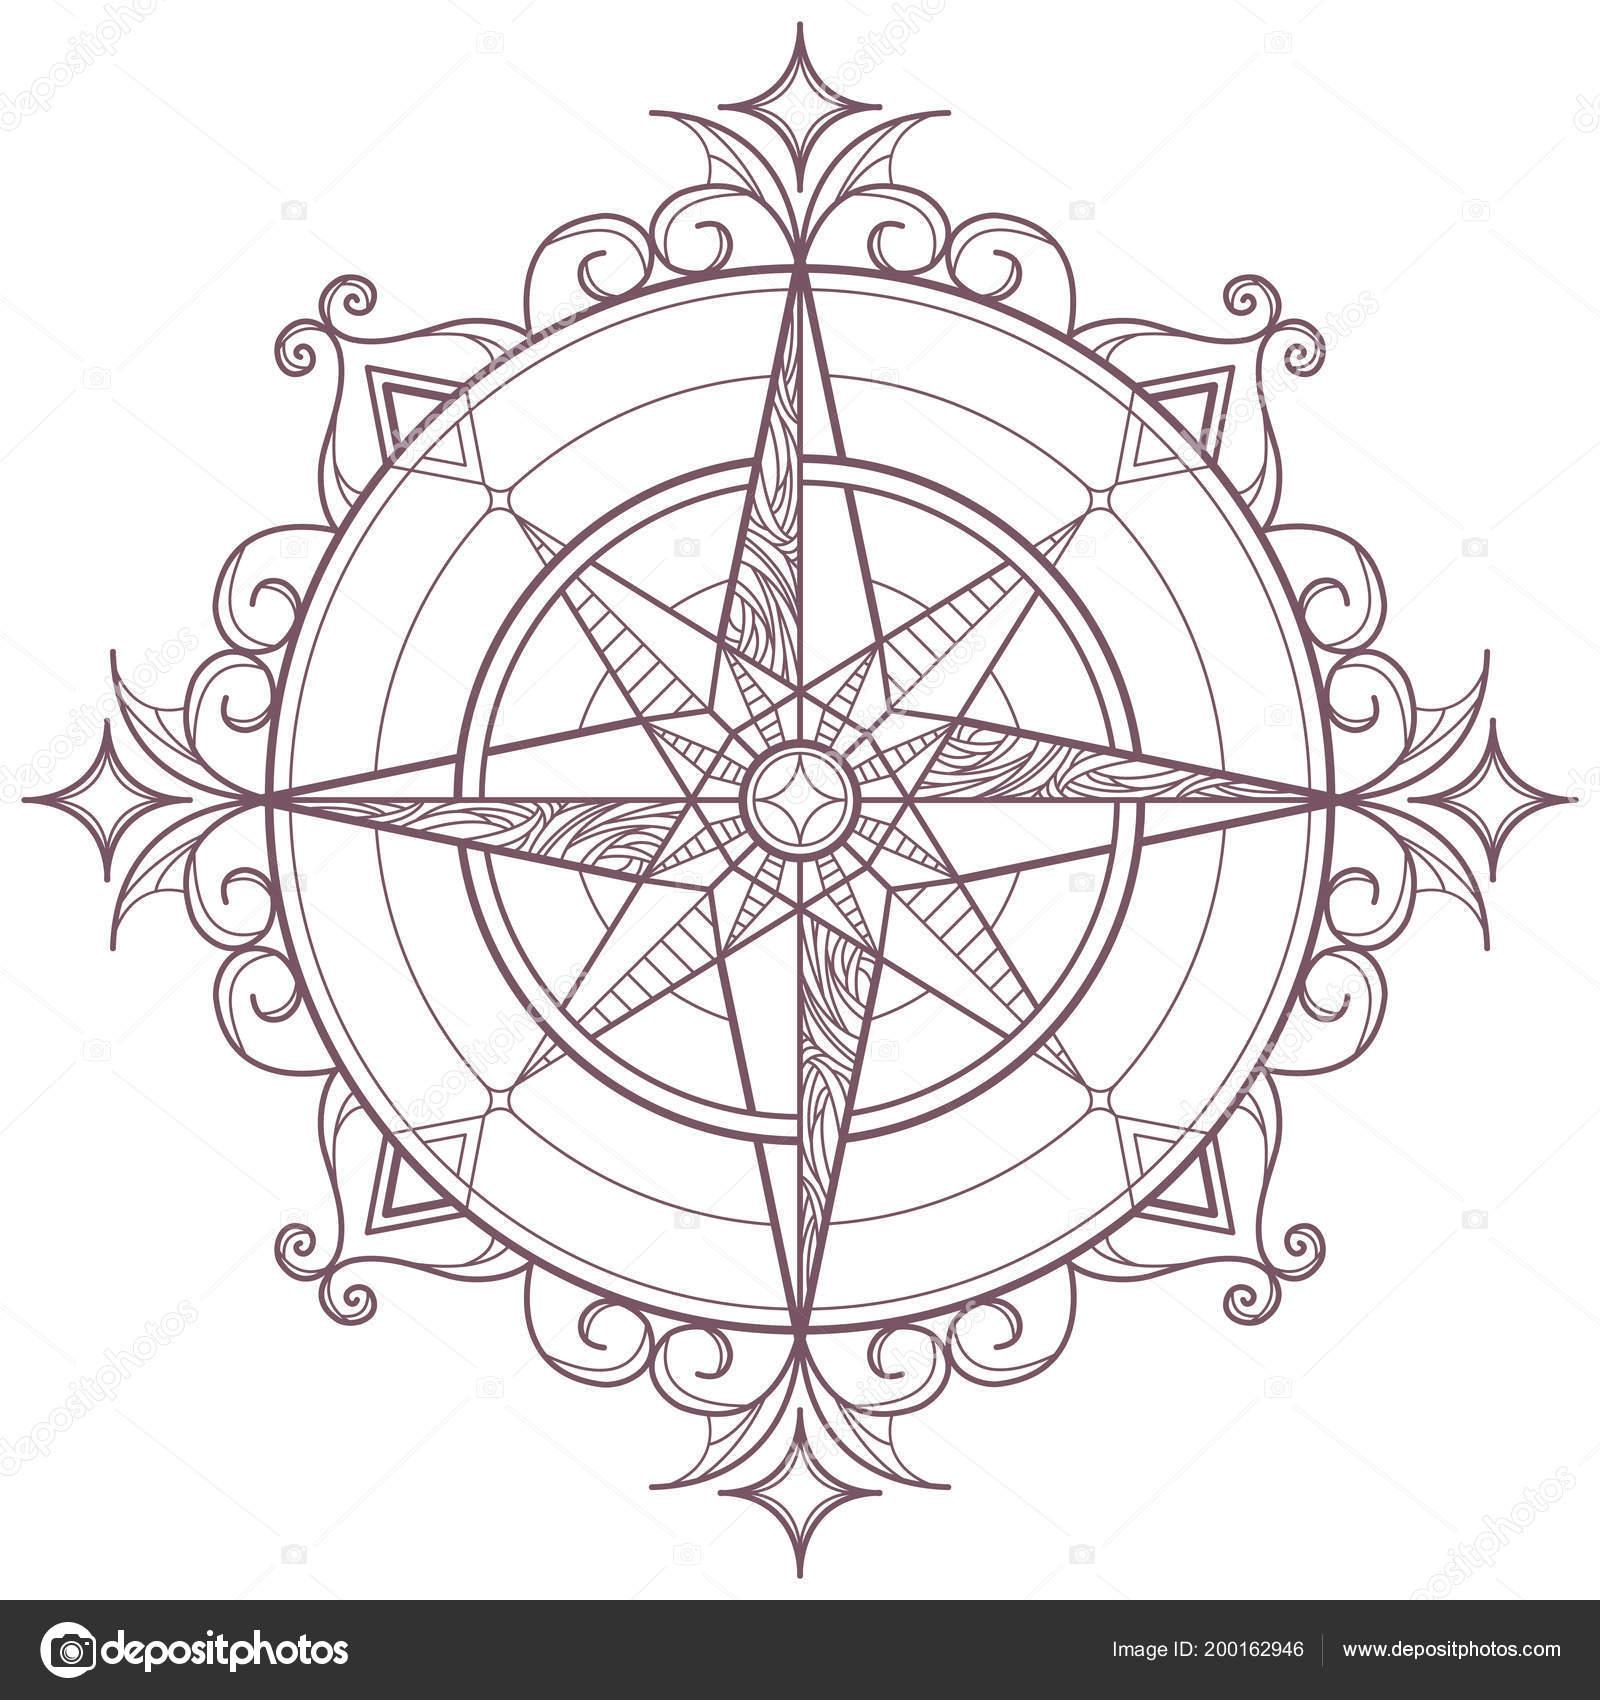 Línea Arte Circular Intrincado Mandala Forma Brújula Diseñada Para ...